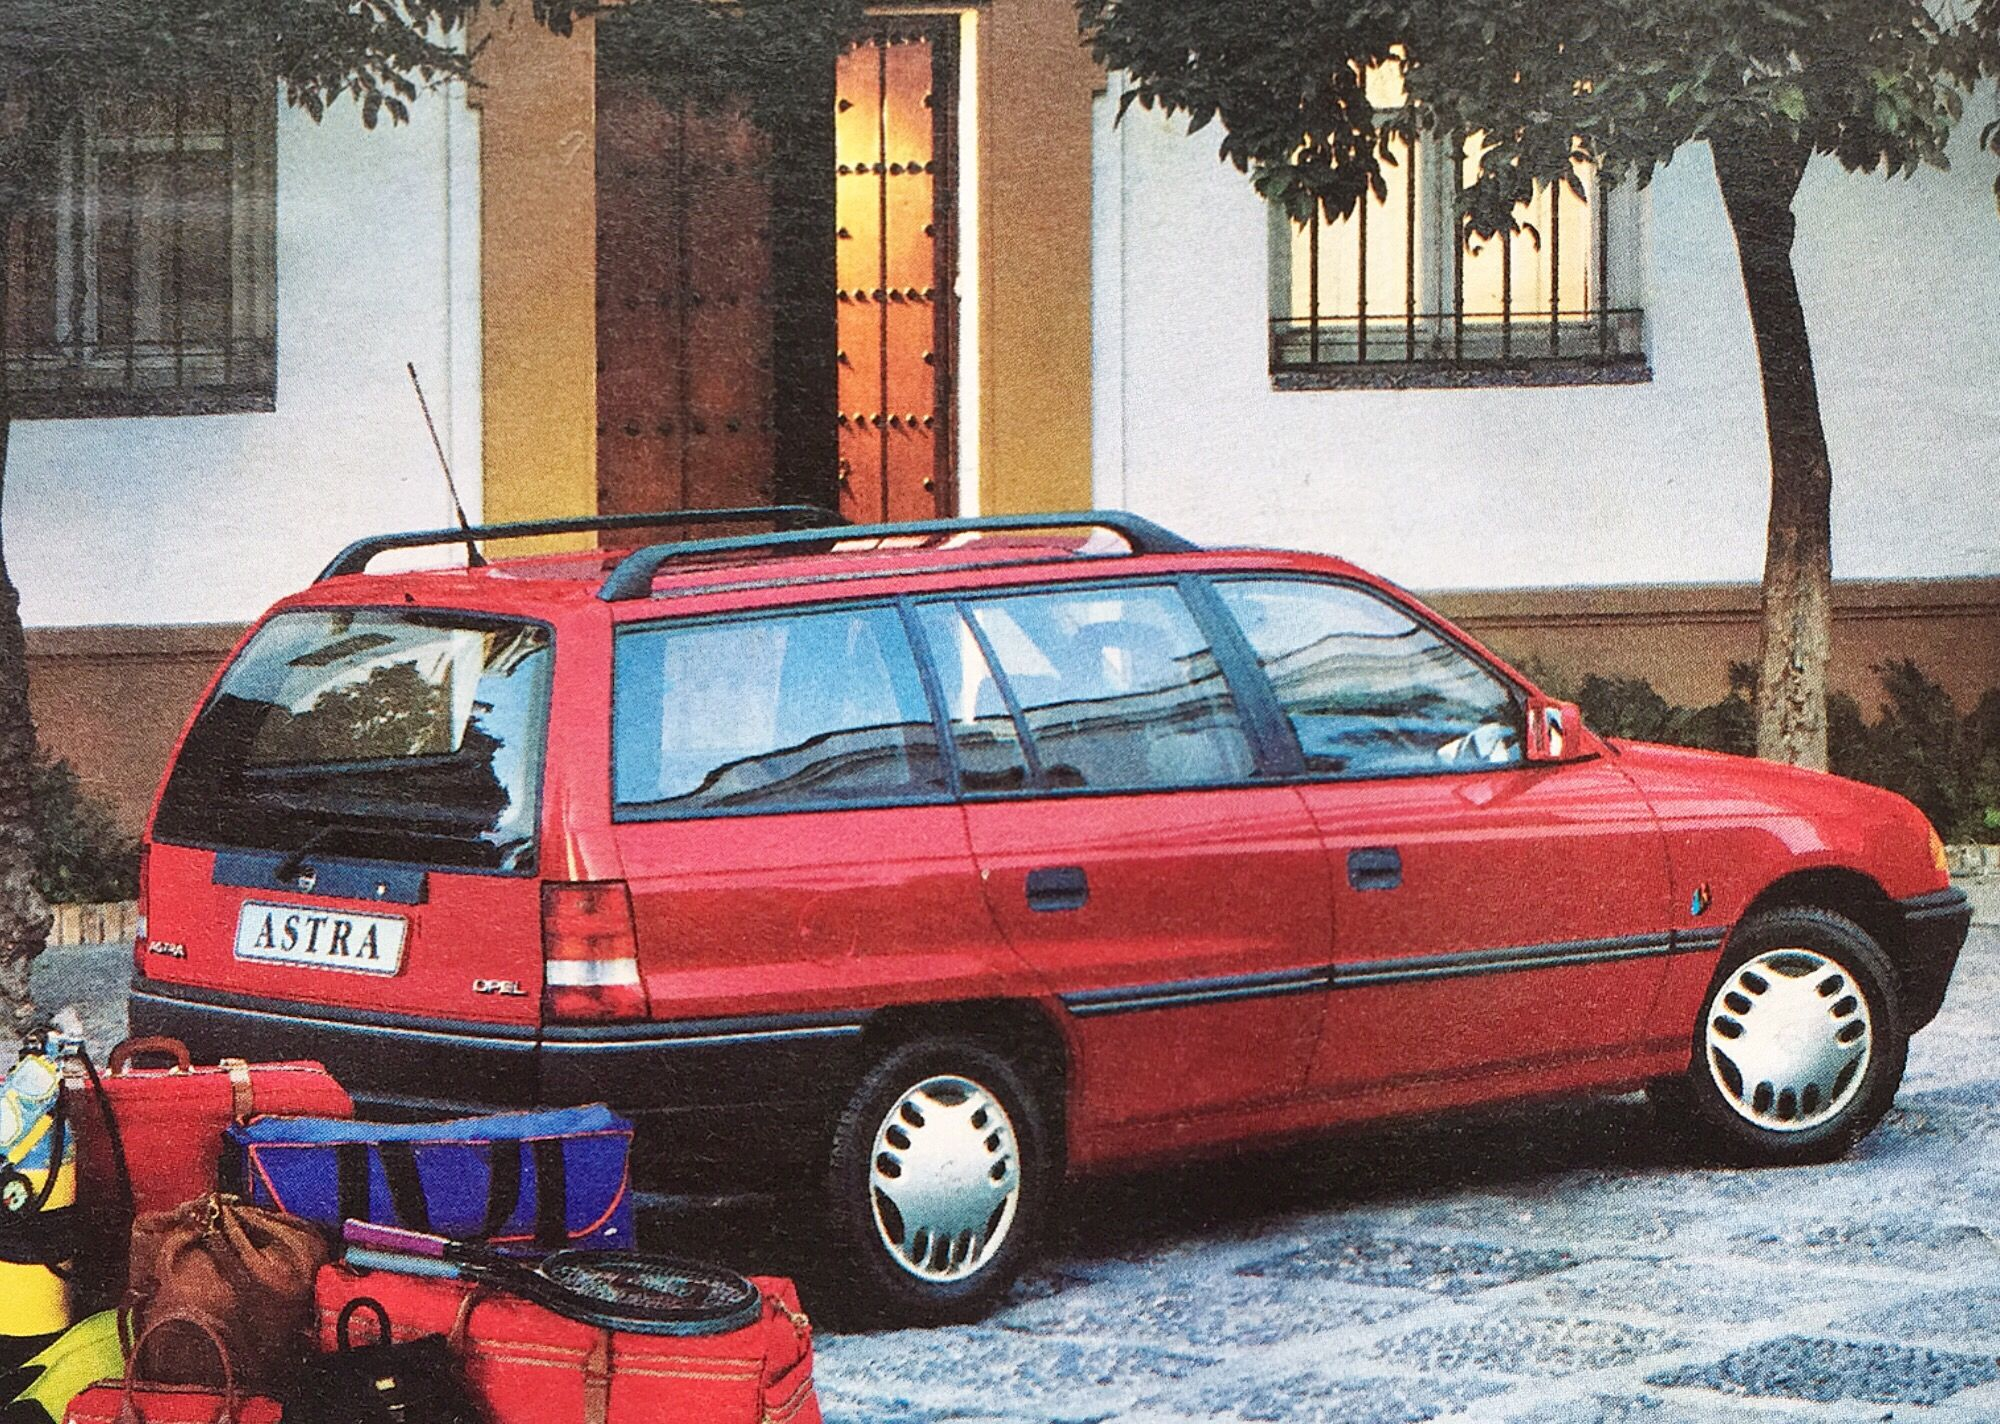 Opel Astra Caravan 1 4 Si Young